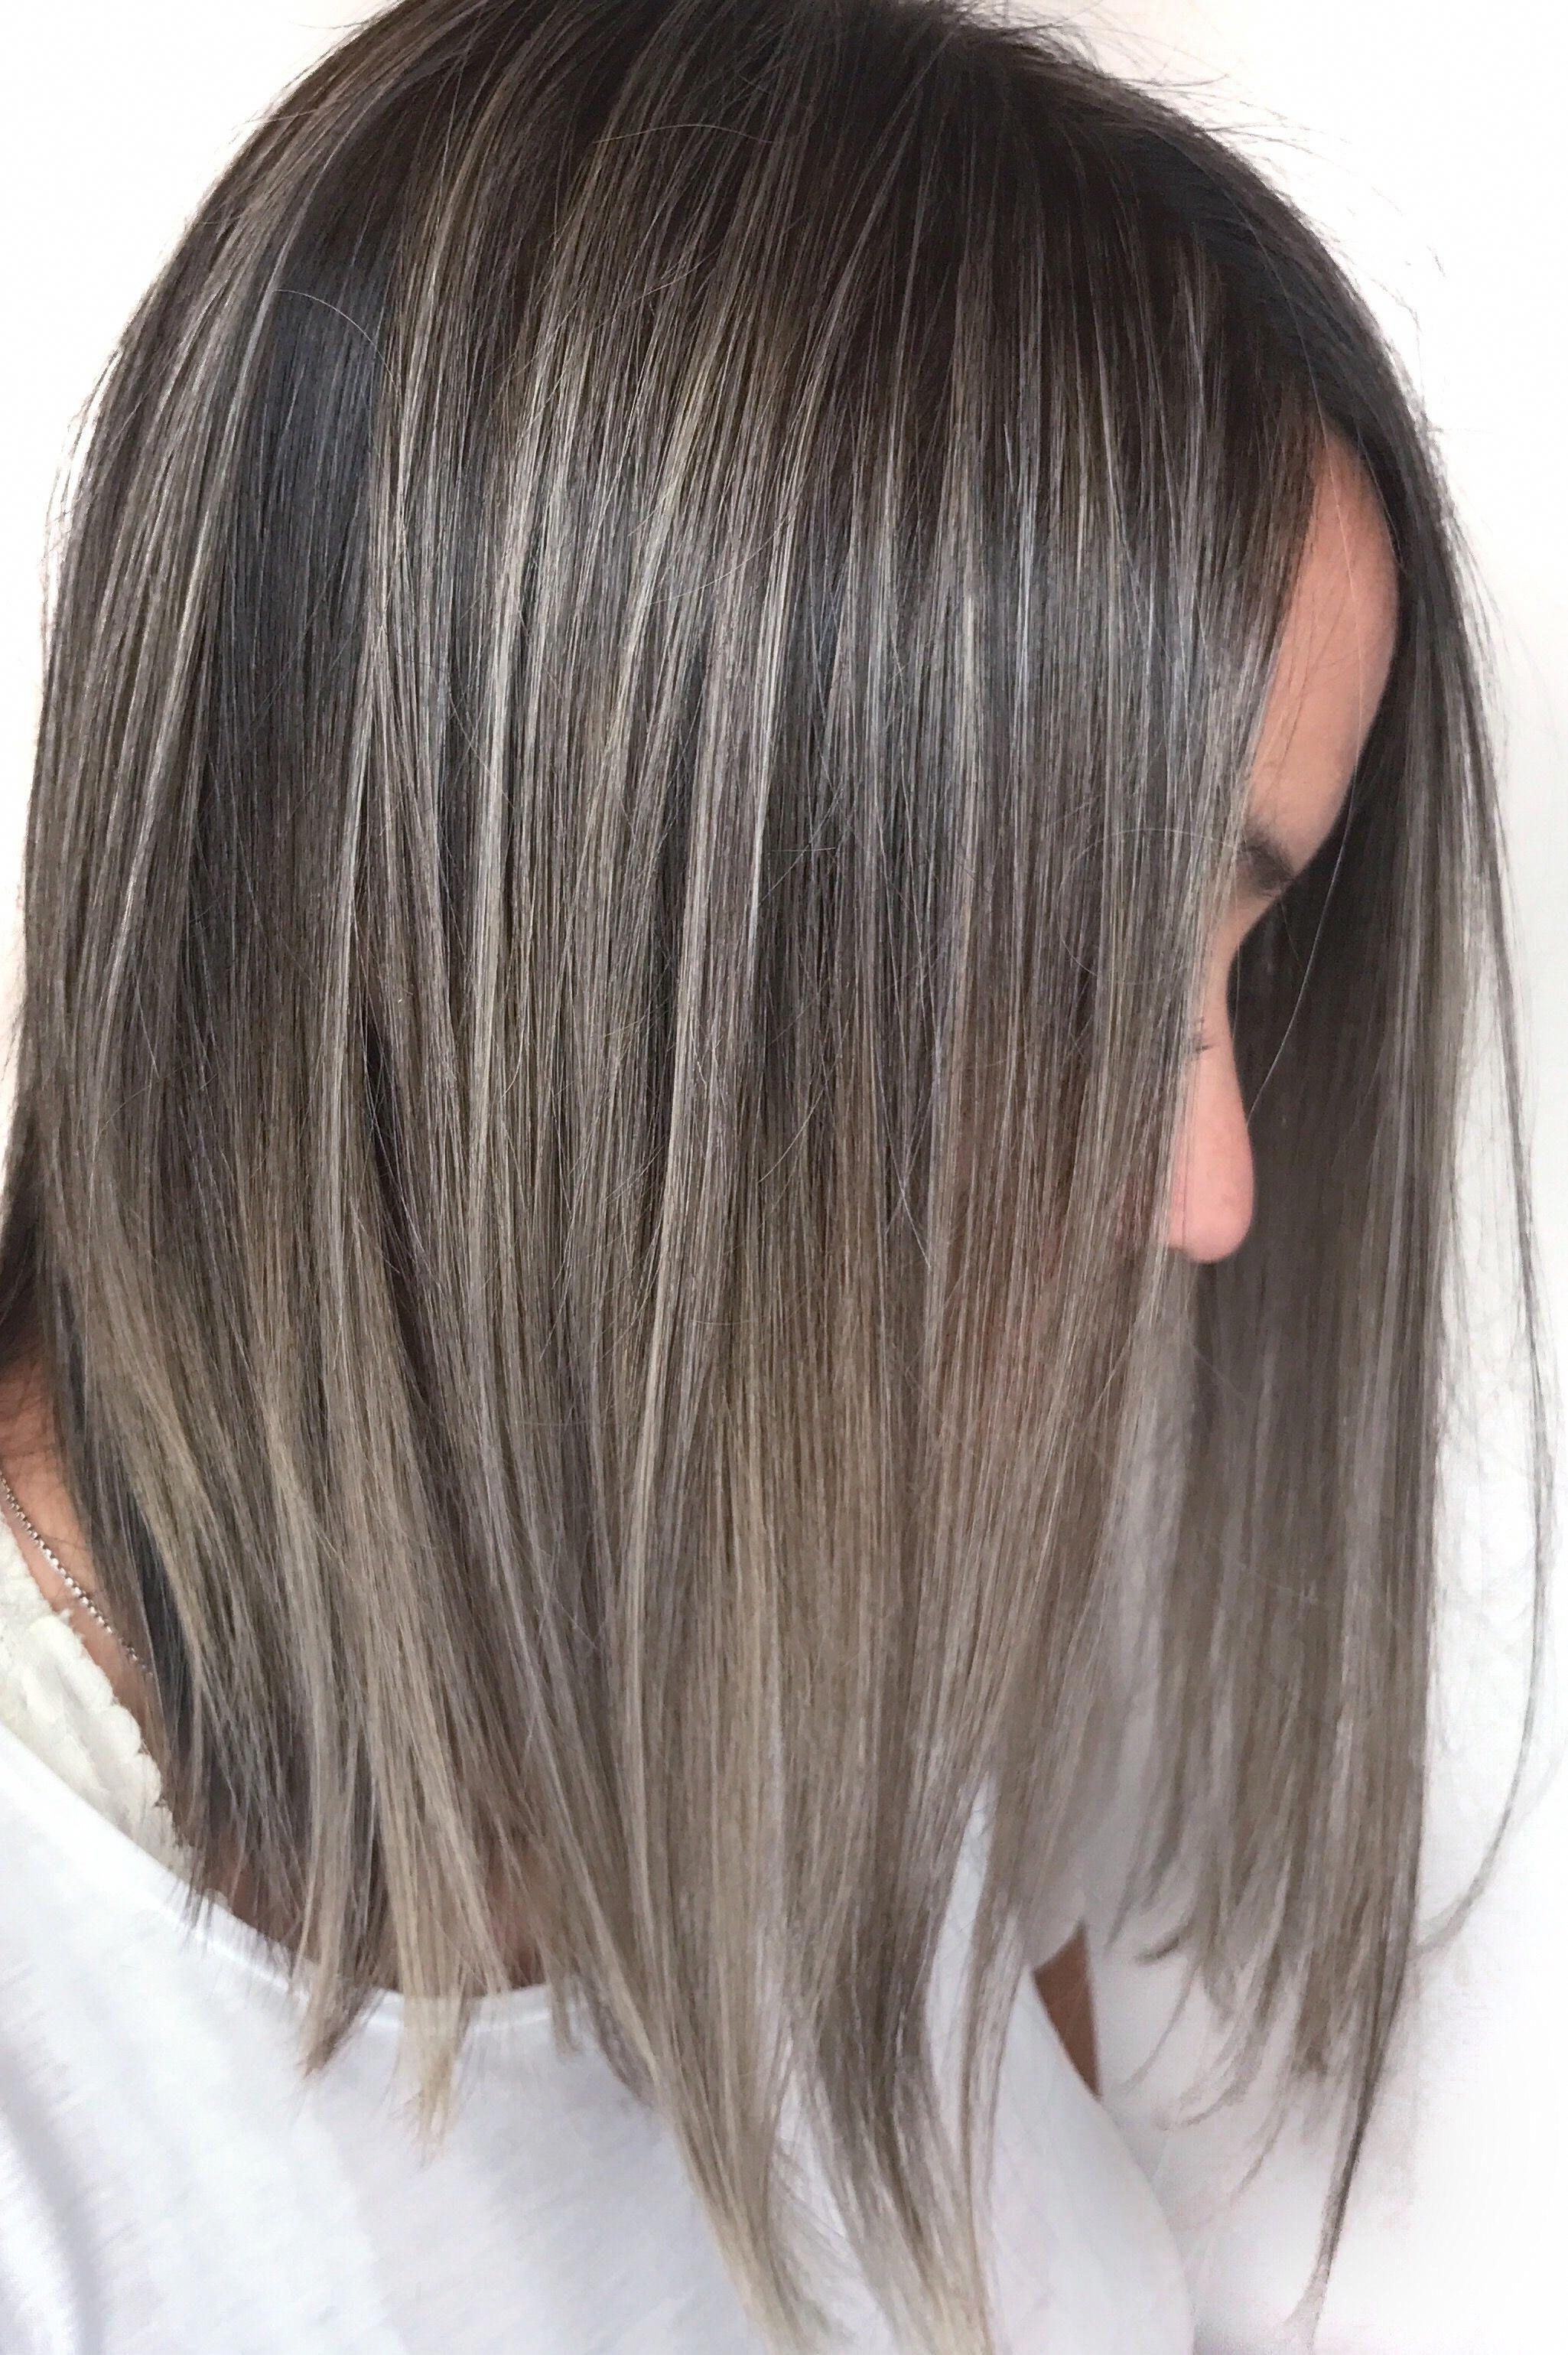 silver vit hårfärg